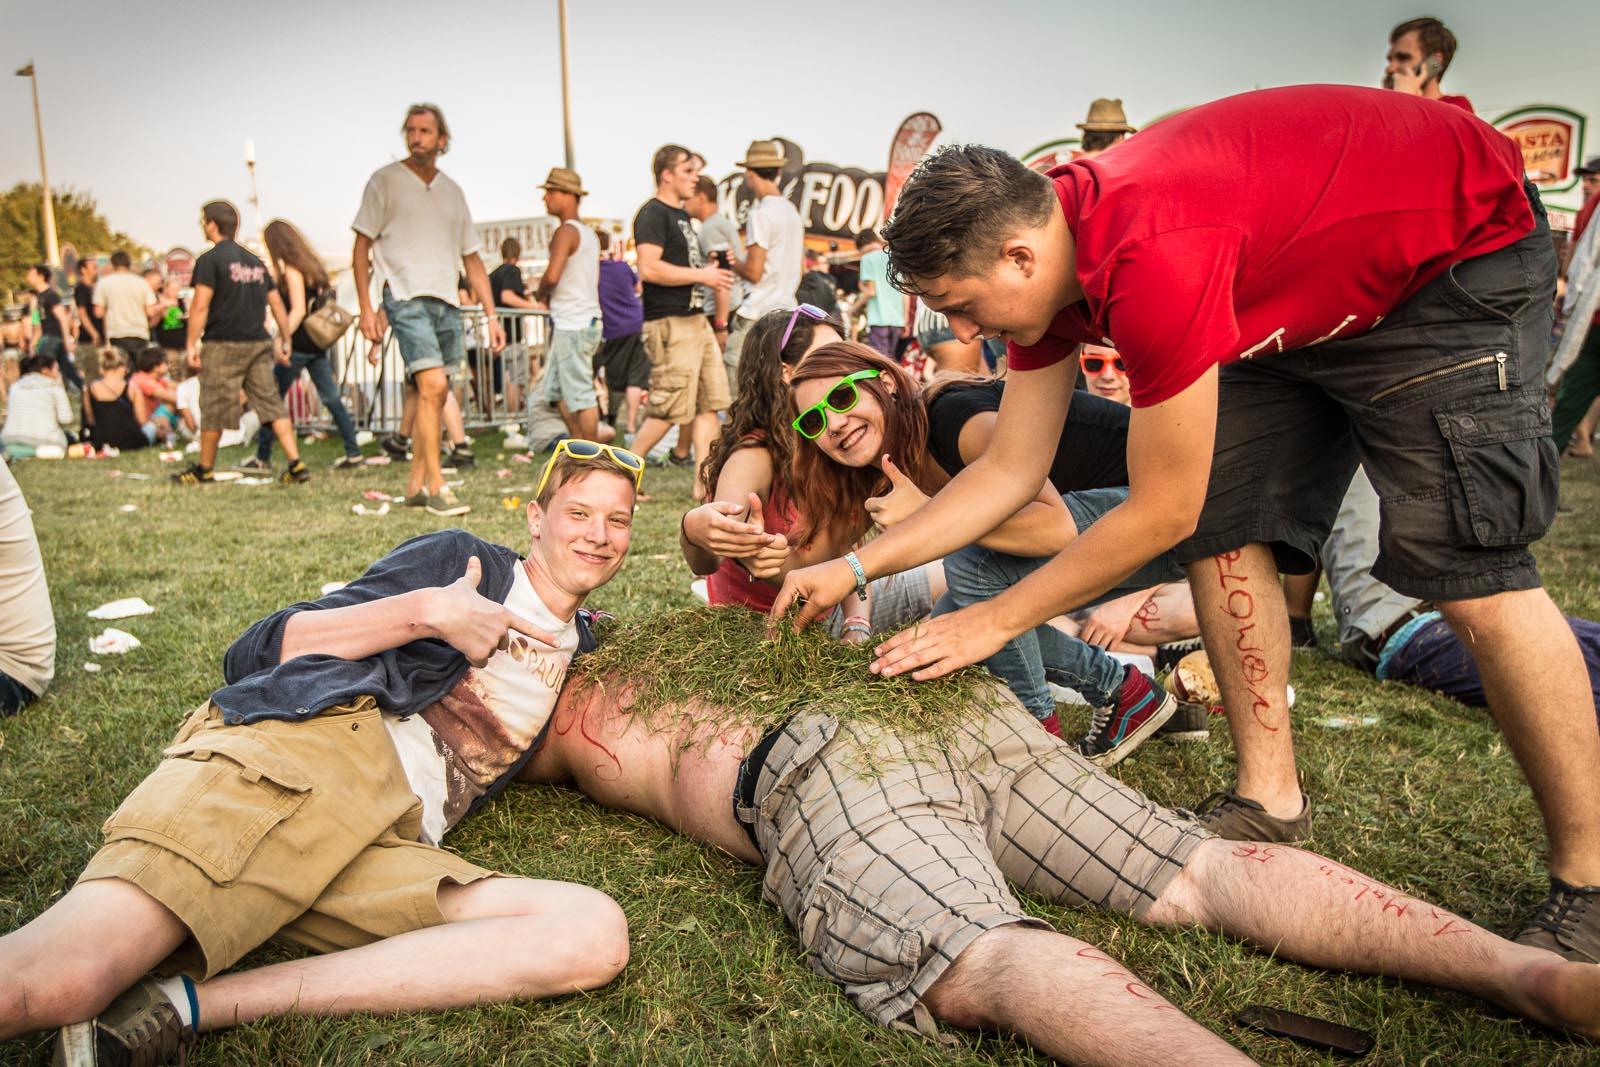 Festival camoflage.